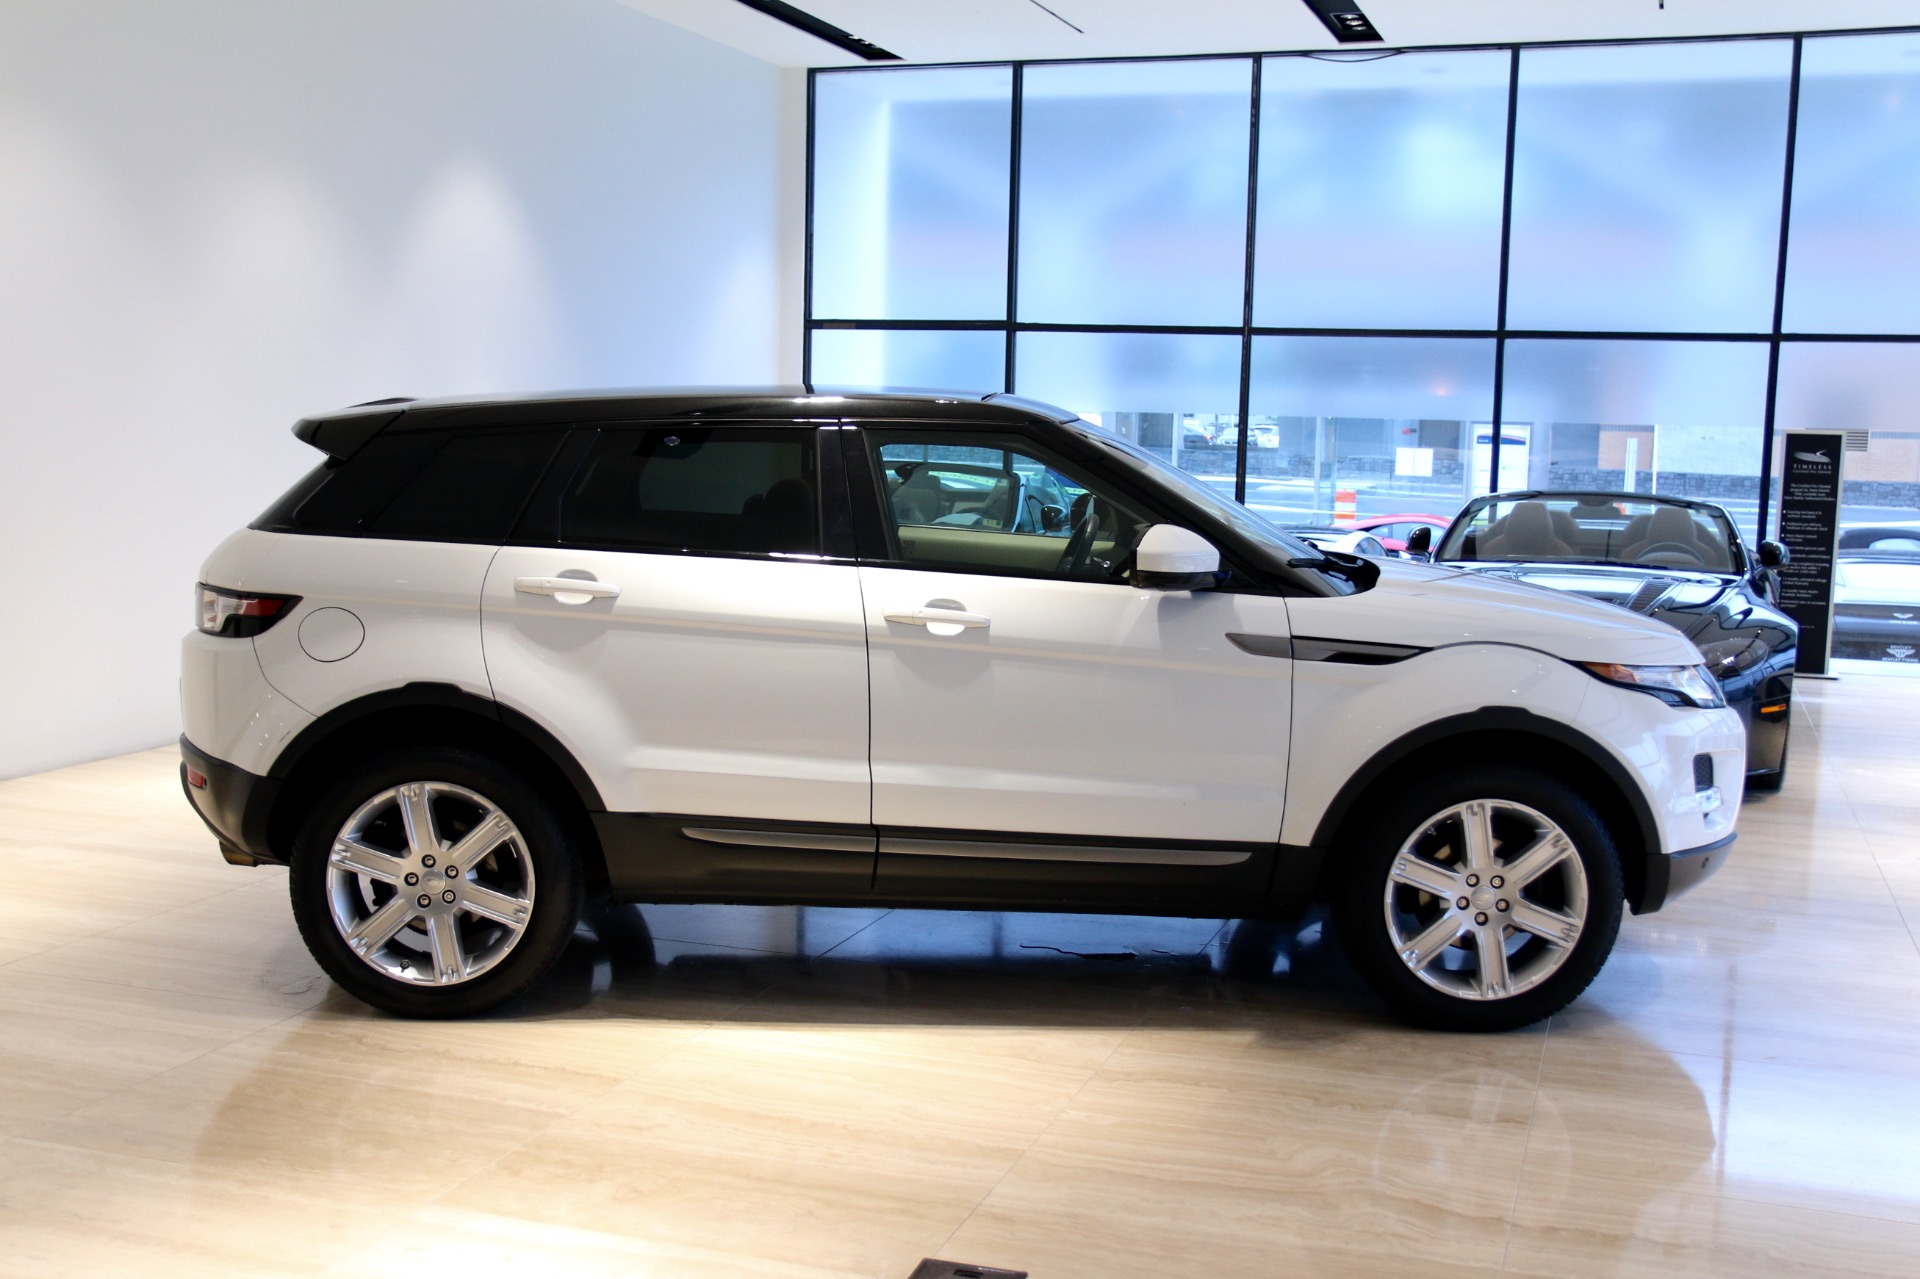 Land Rover For Sale Near Me >> 2015 Land Rover Range Rover Evoque Pure Plus Stock # P052706 for sale near Vienna, VA | VA Land ...